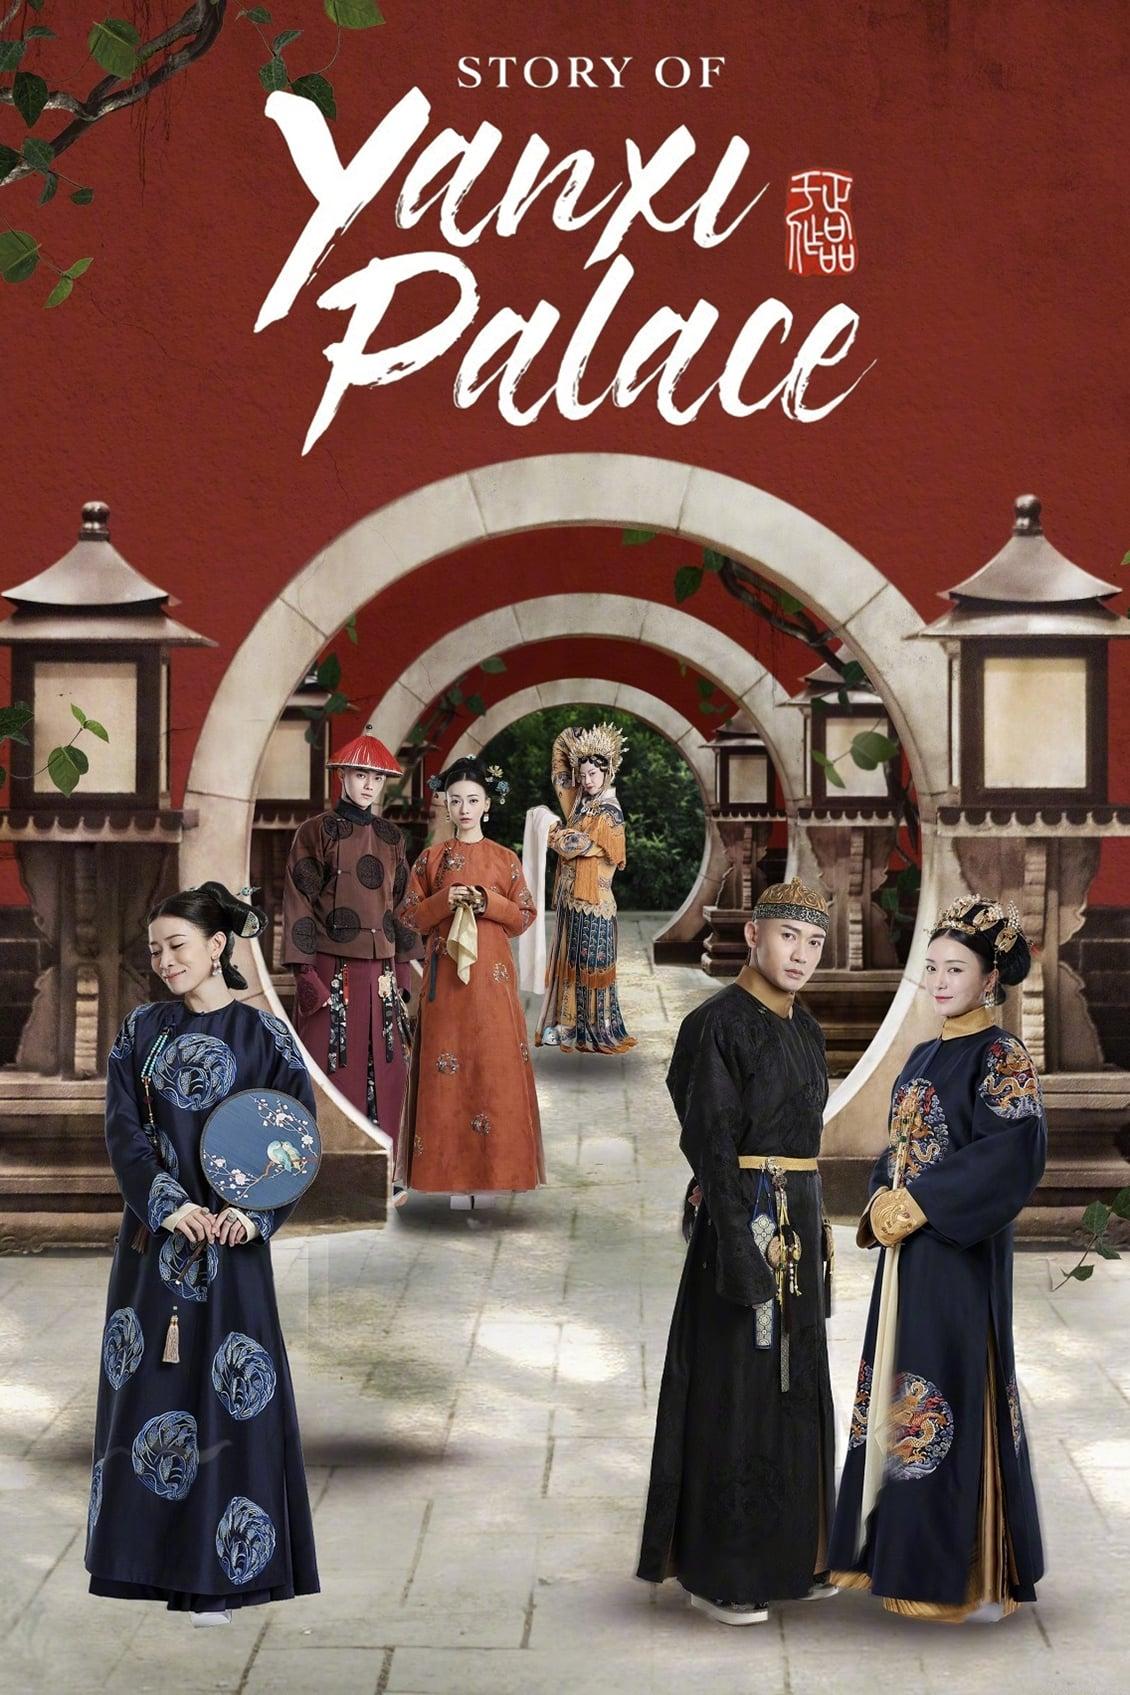 延禧攻略 TV Shows About Palace Intrigue